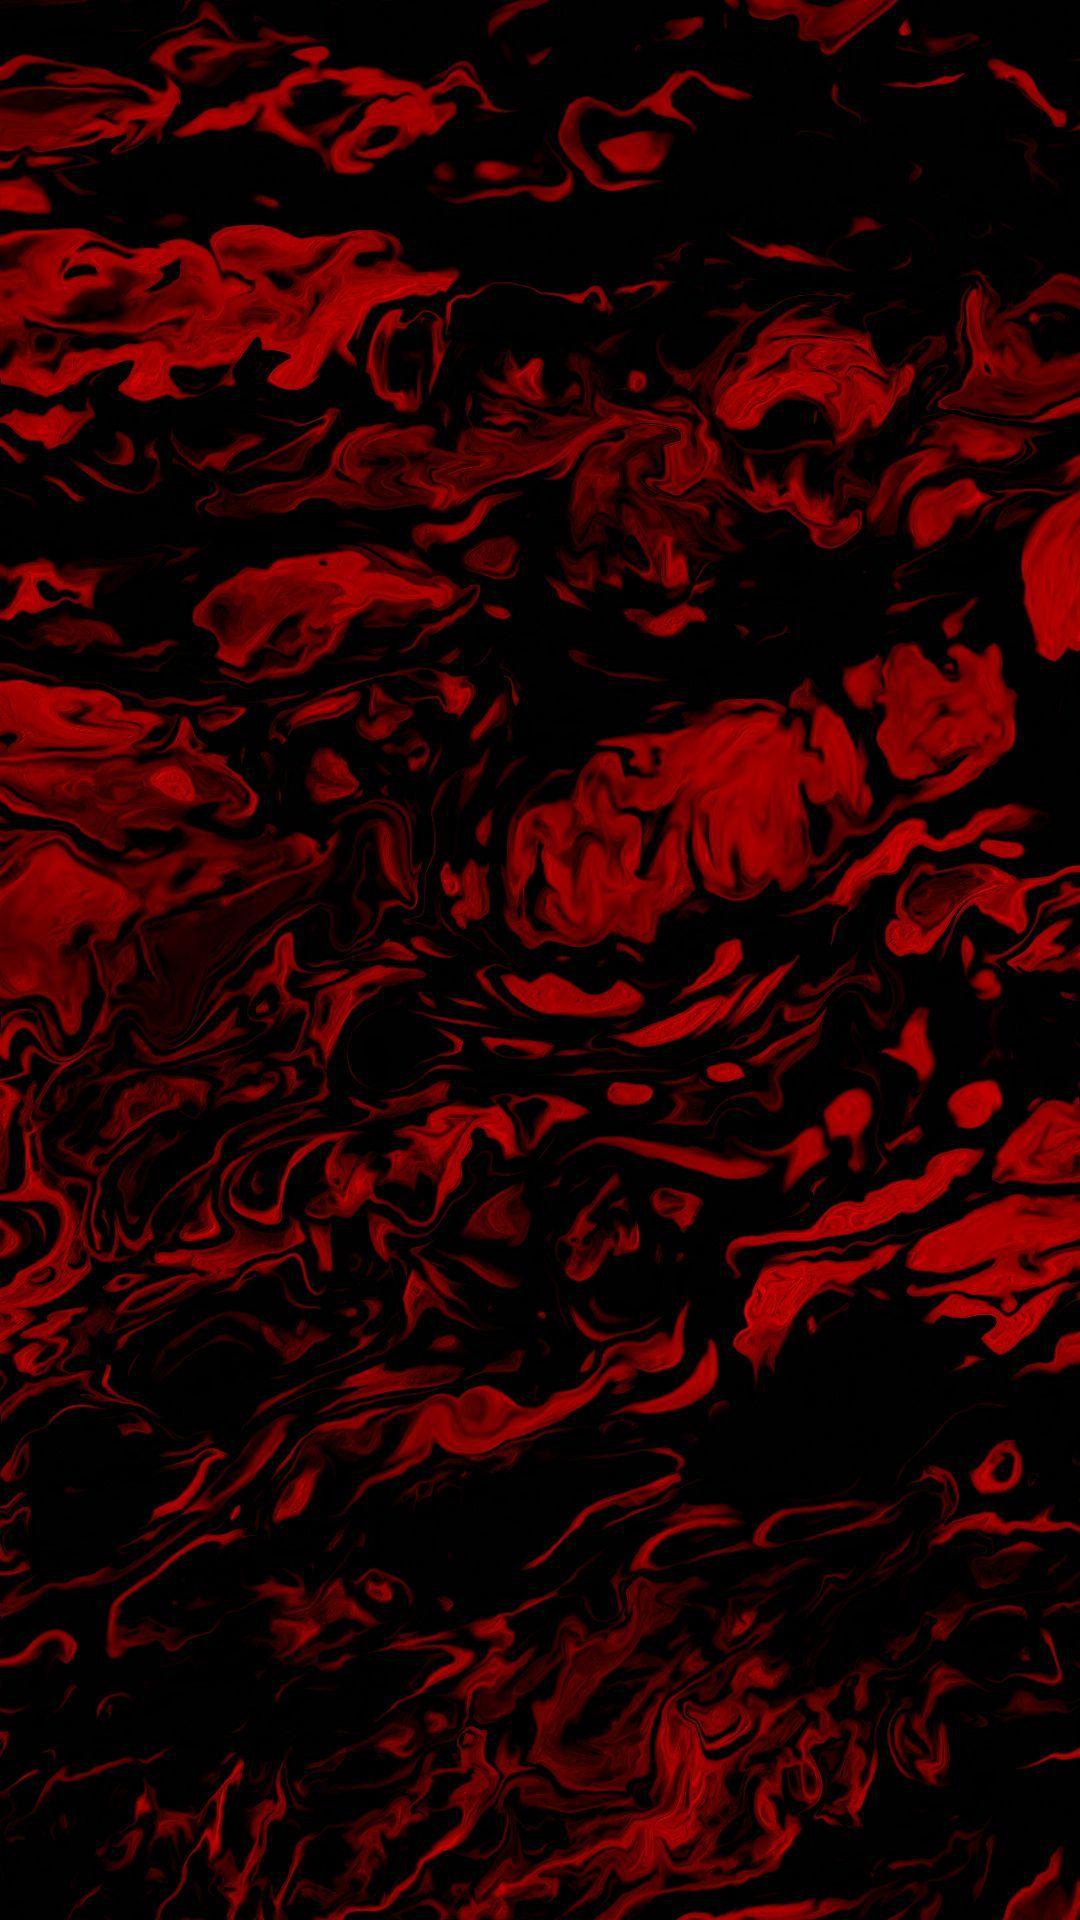 Black Red hd wallpaper